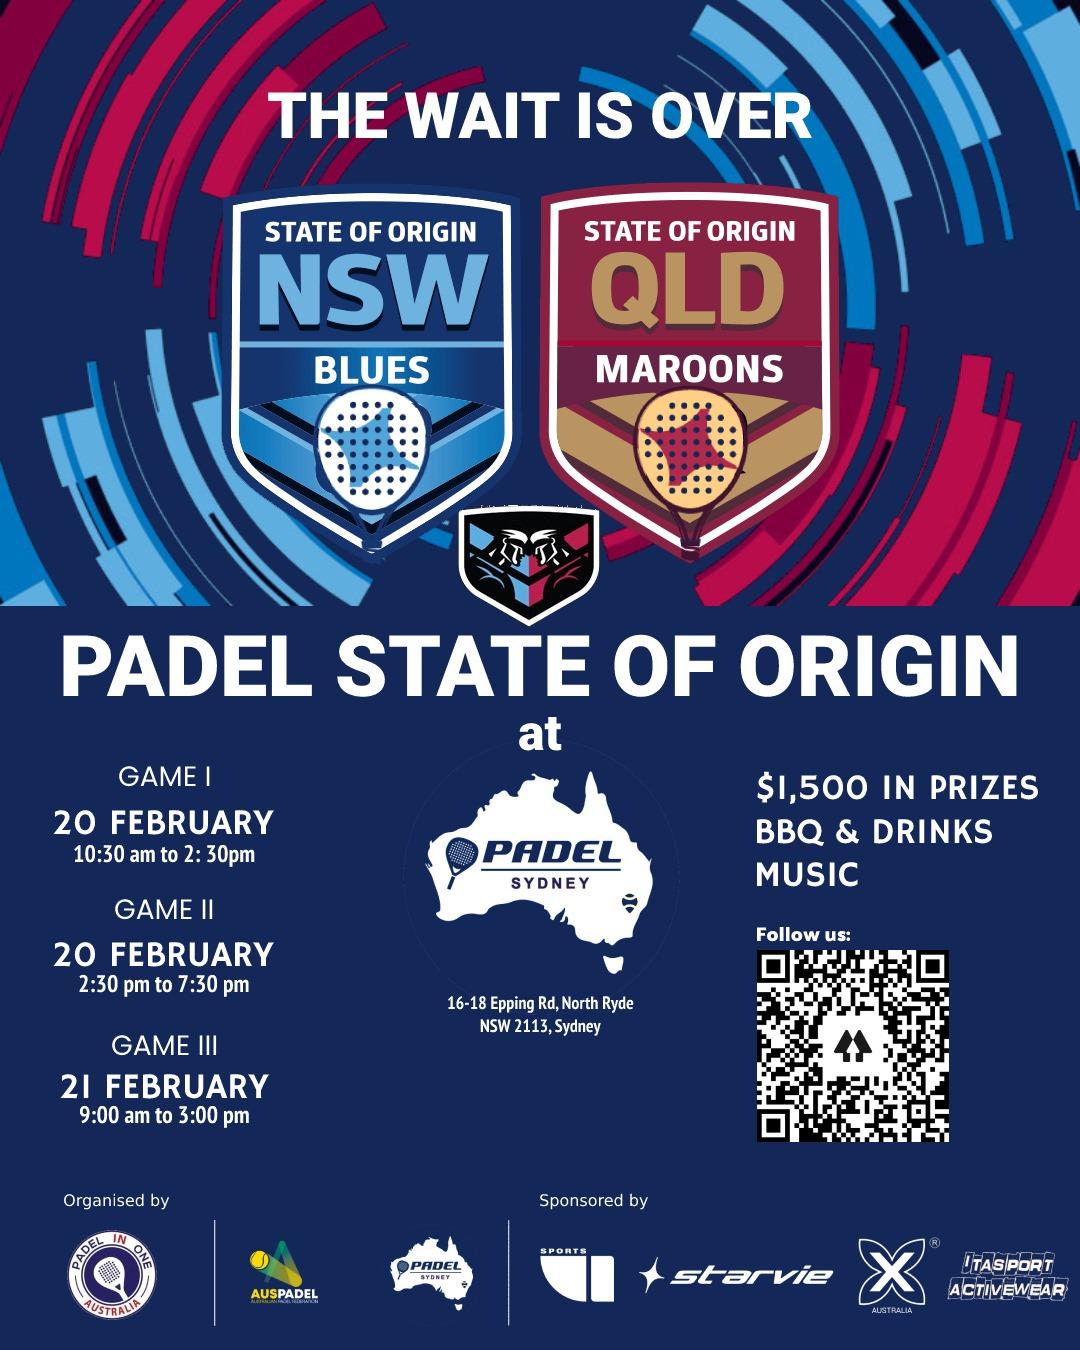 турнир Padel State of Origin в Австралии